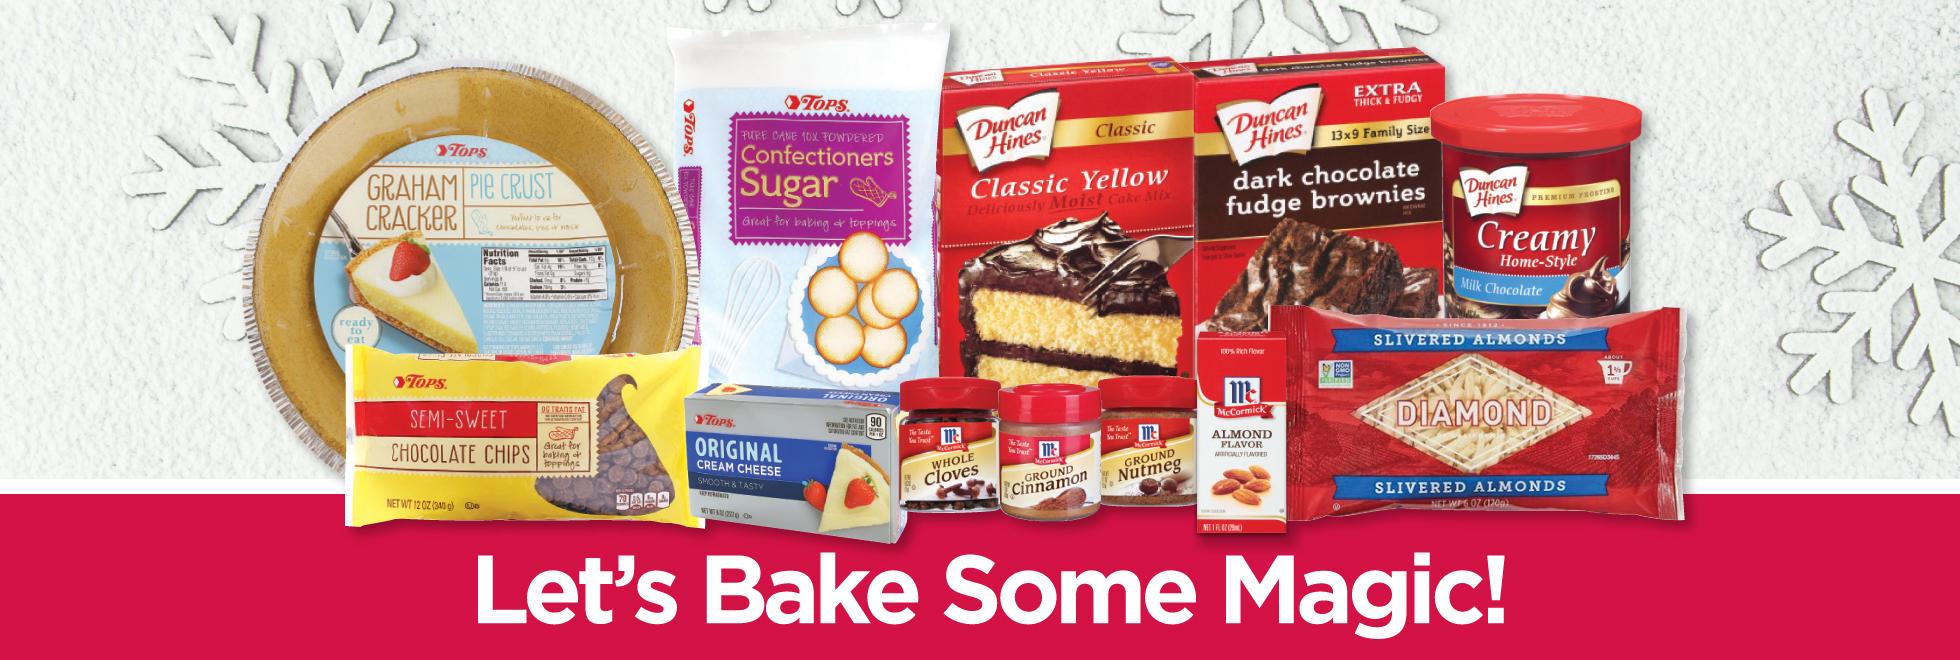 Holiday Baking Savings on Essentials